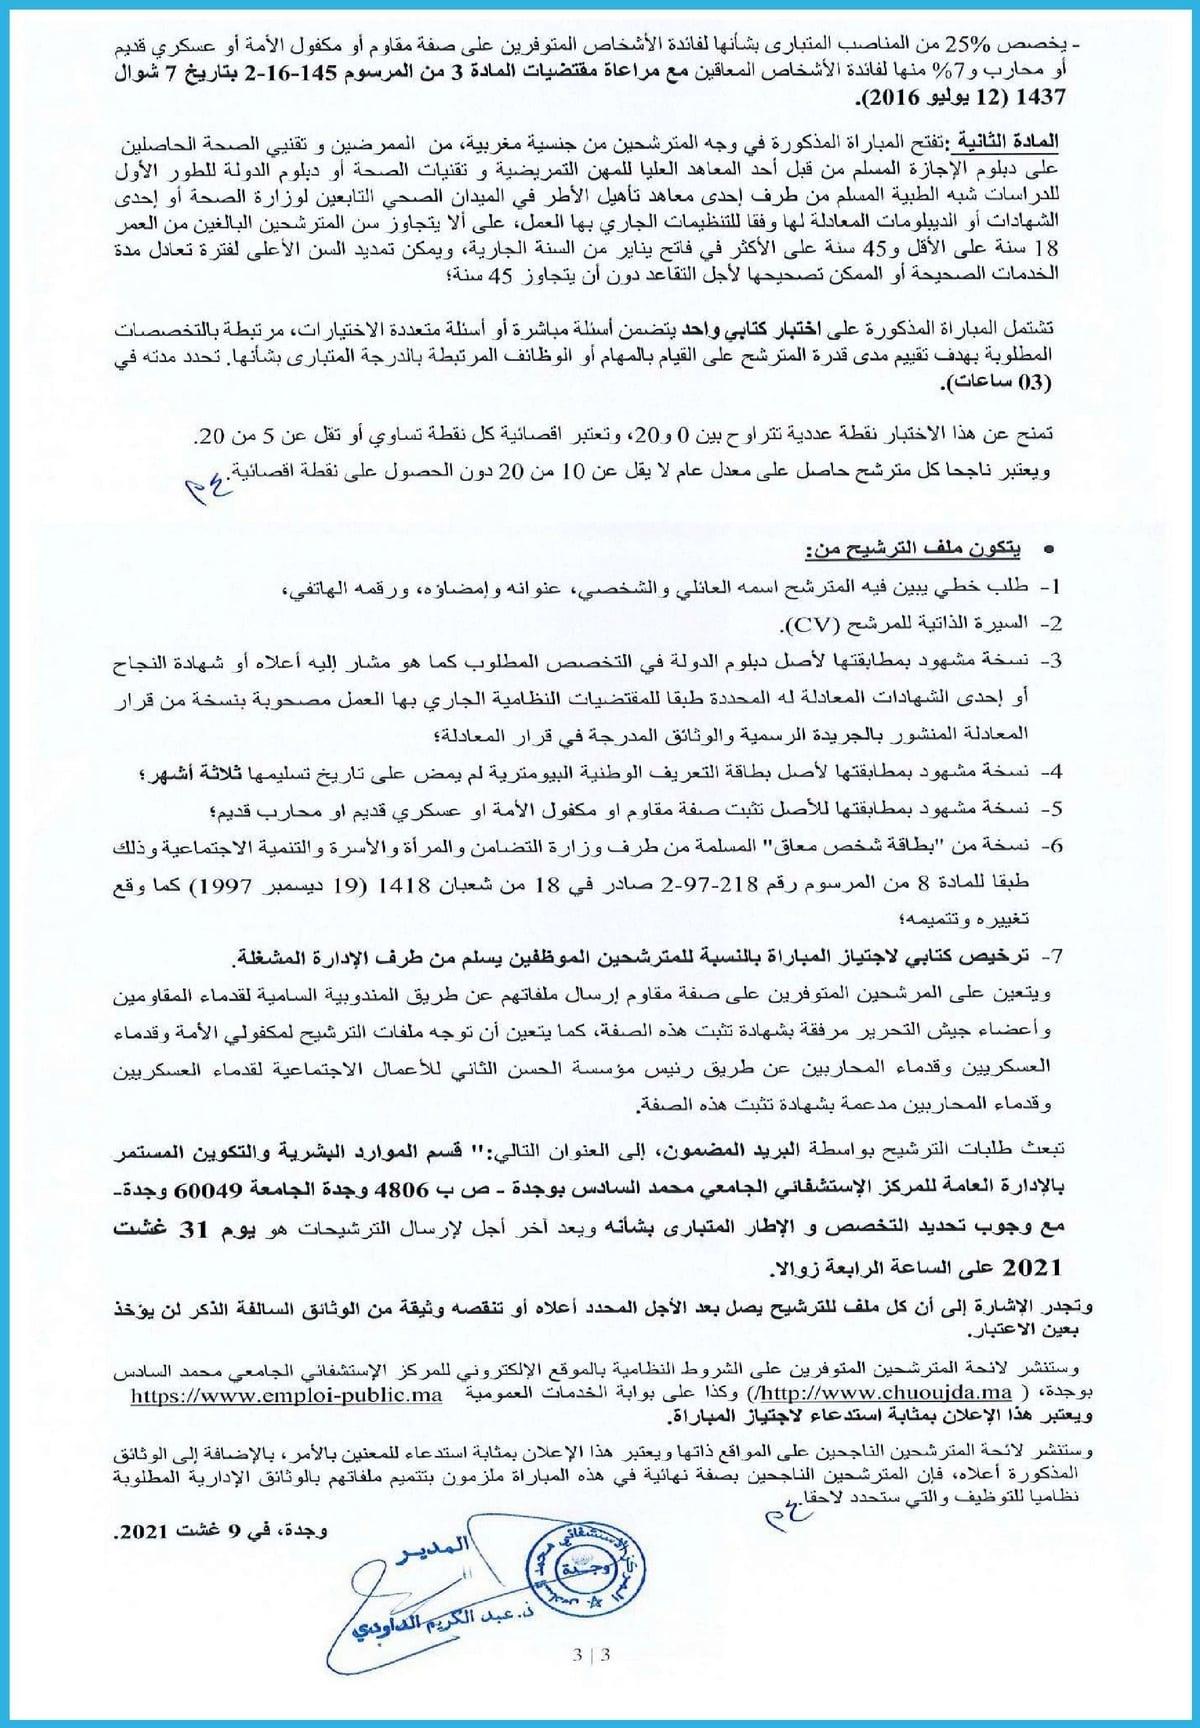 chu m611 Concours CHU Mohammed VI Oujda 2021 (40 Postes)